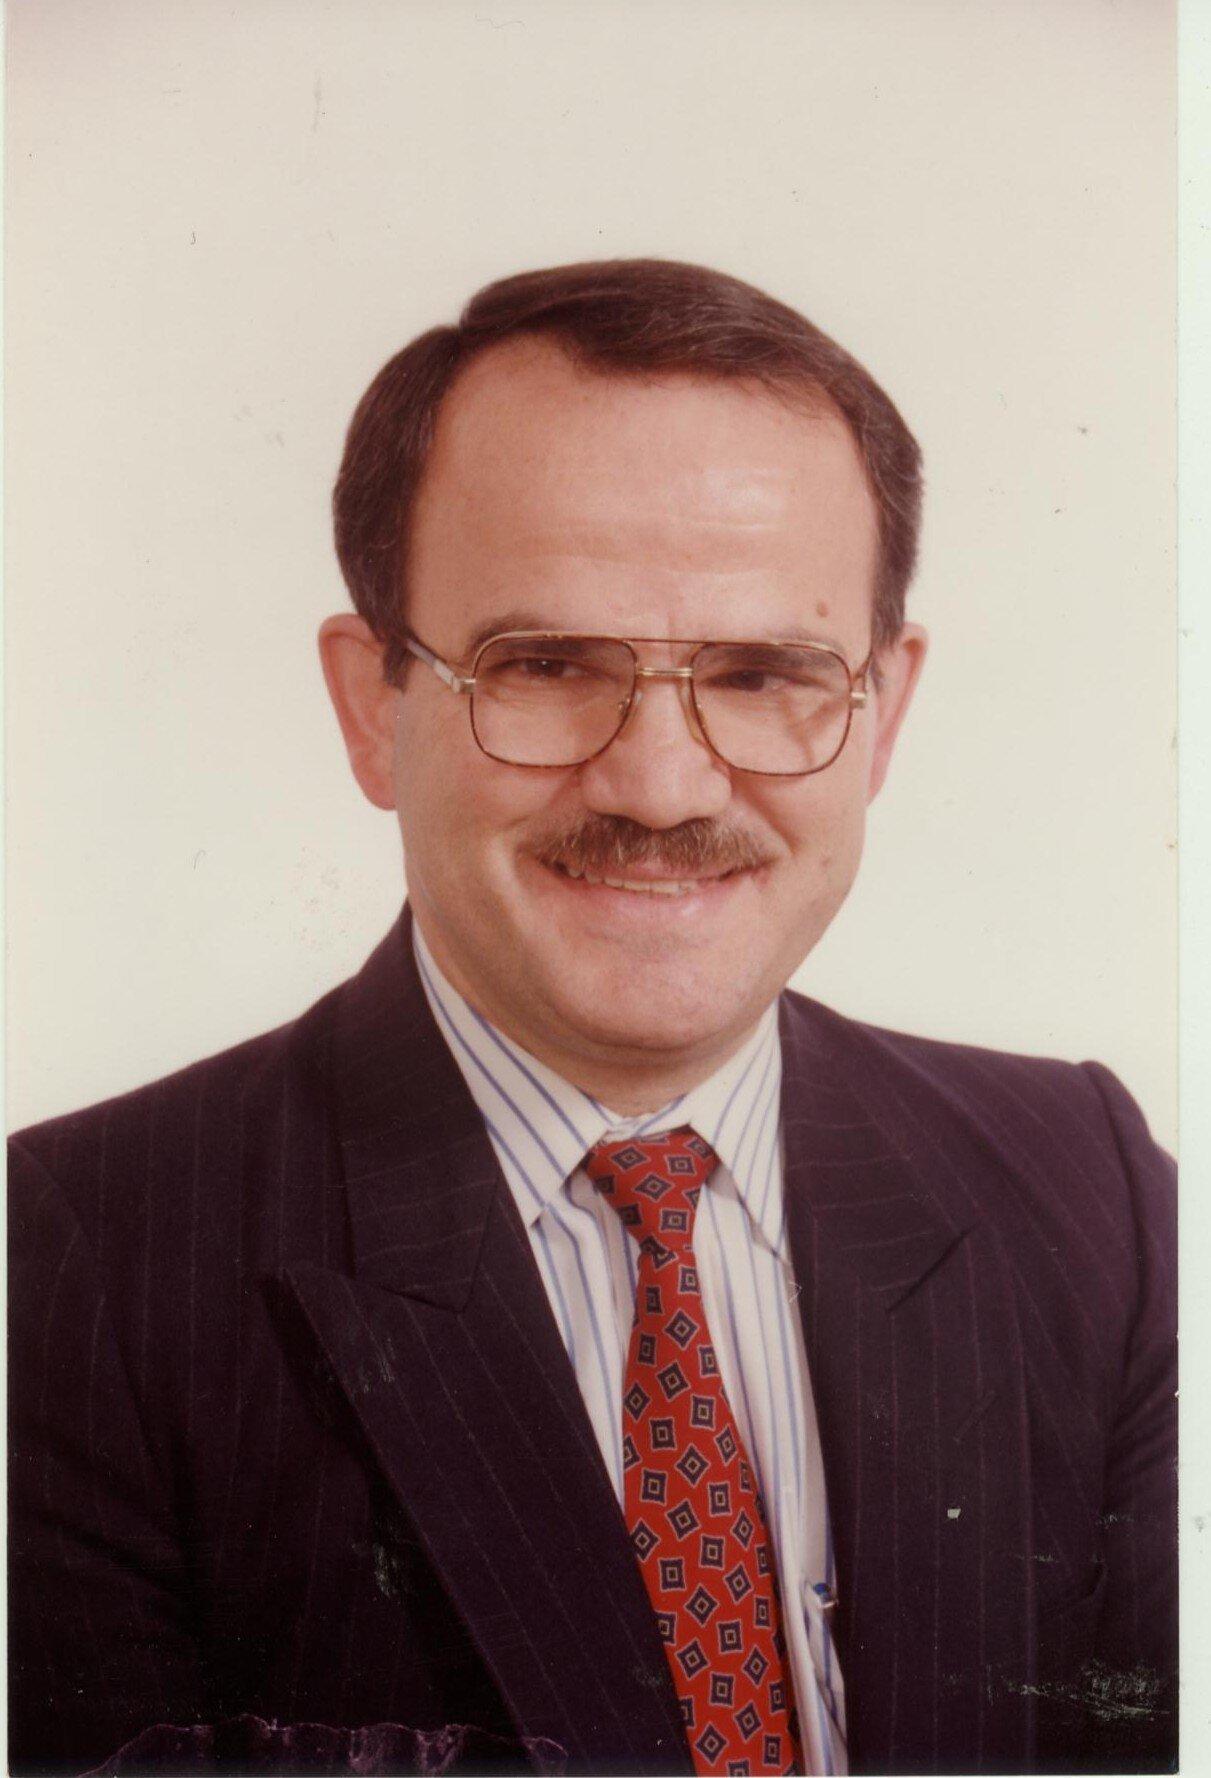 James Karas